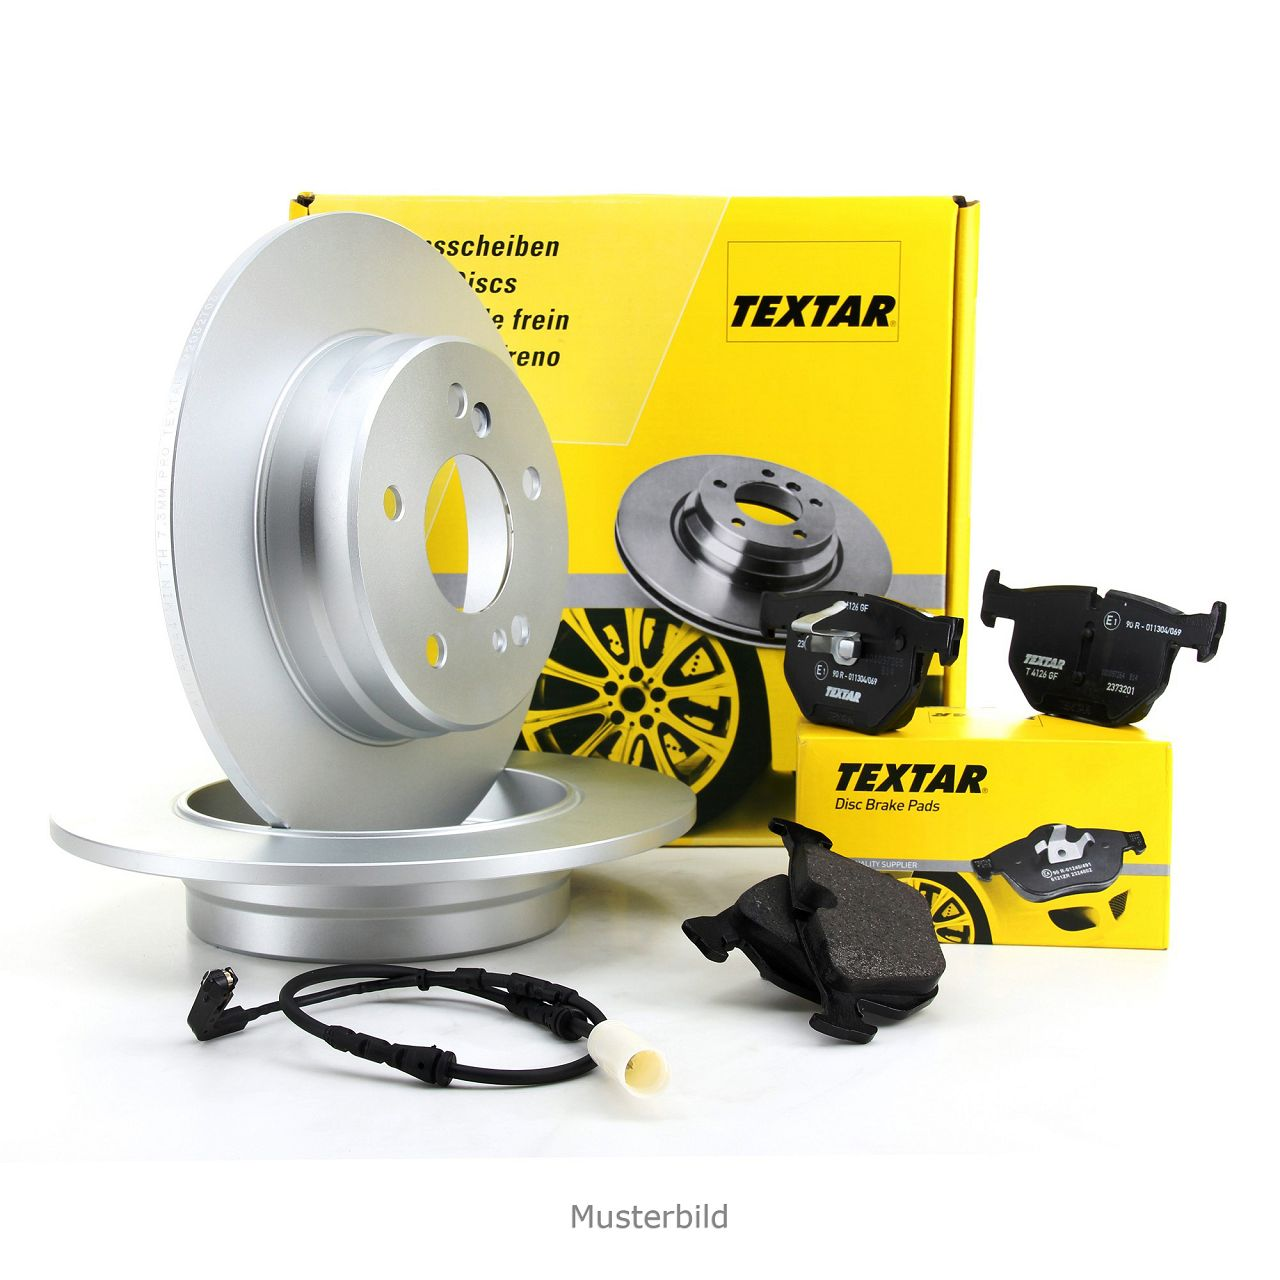 TEXTAR Bremsscheiben + Beläge + Wako MERCEDES W204 C204 S204 A207 C207 hinten